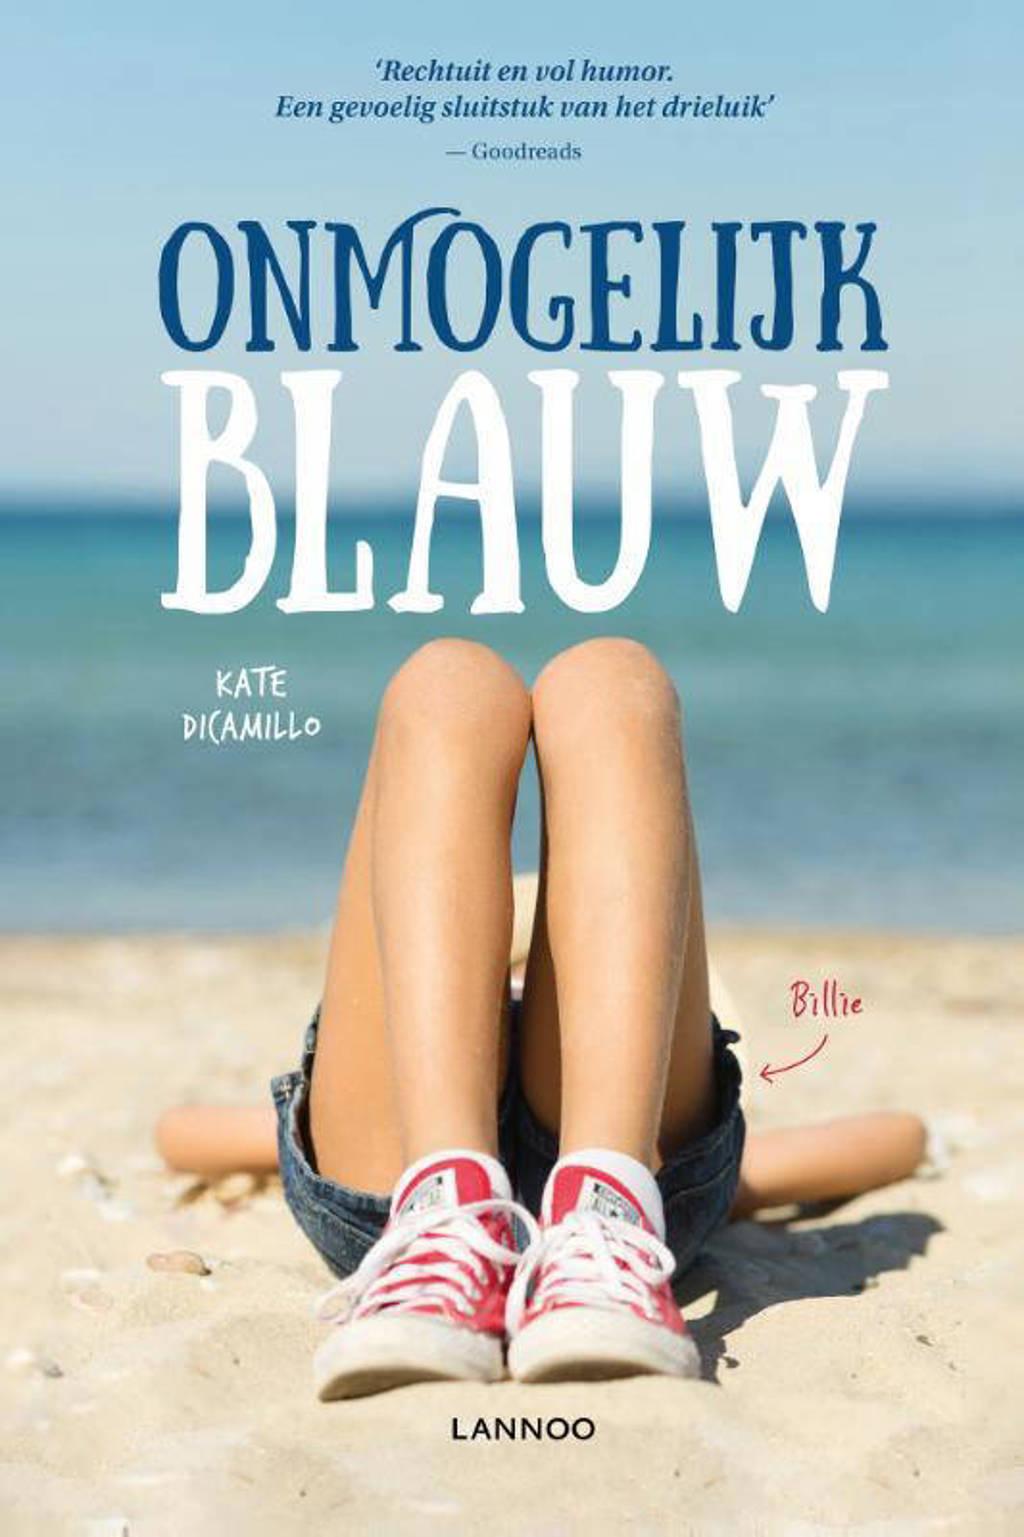 Onmogelijk blauw - Kate Dicamillo